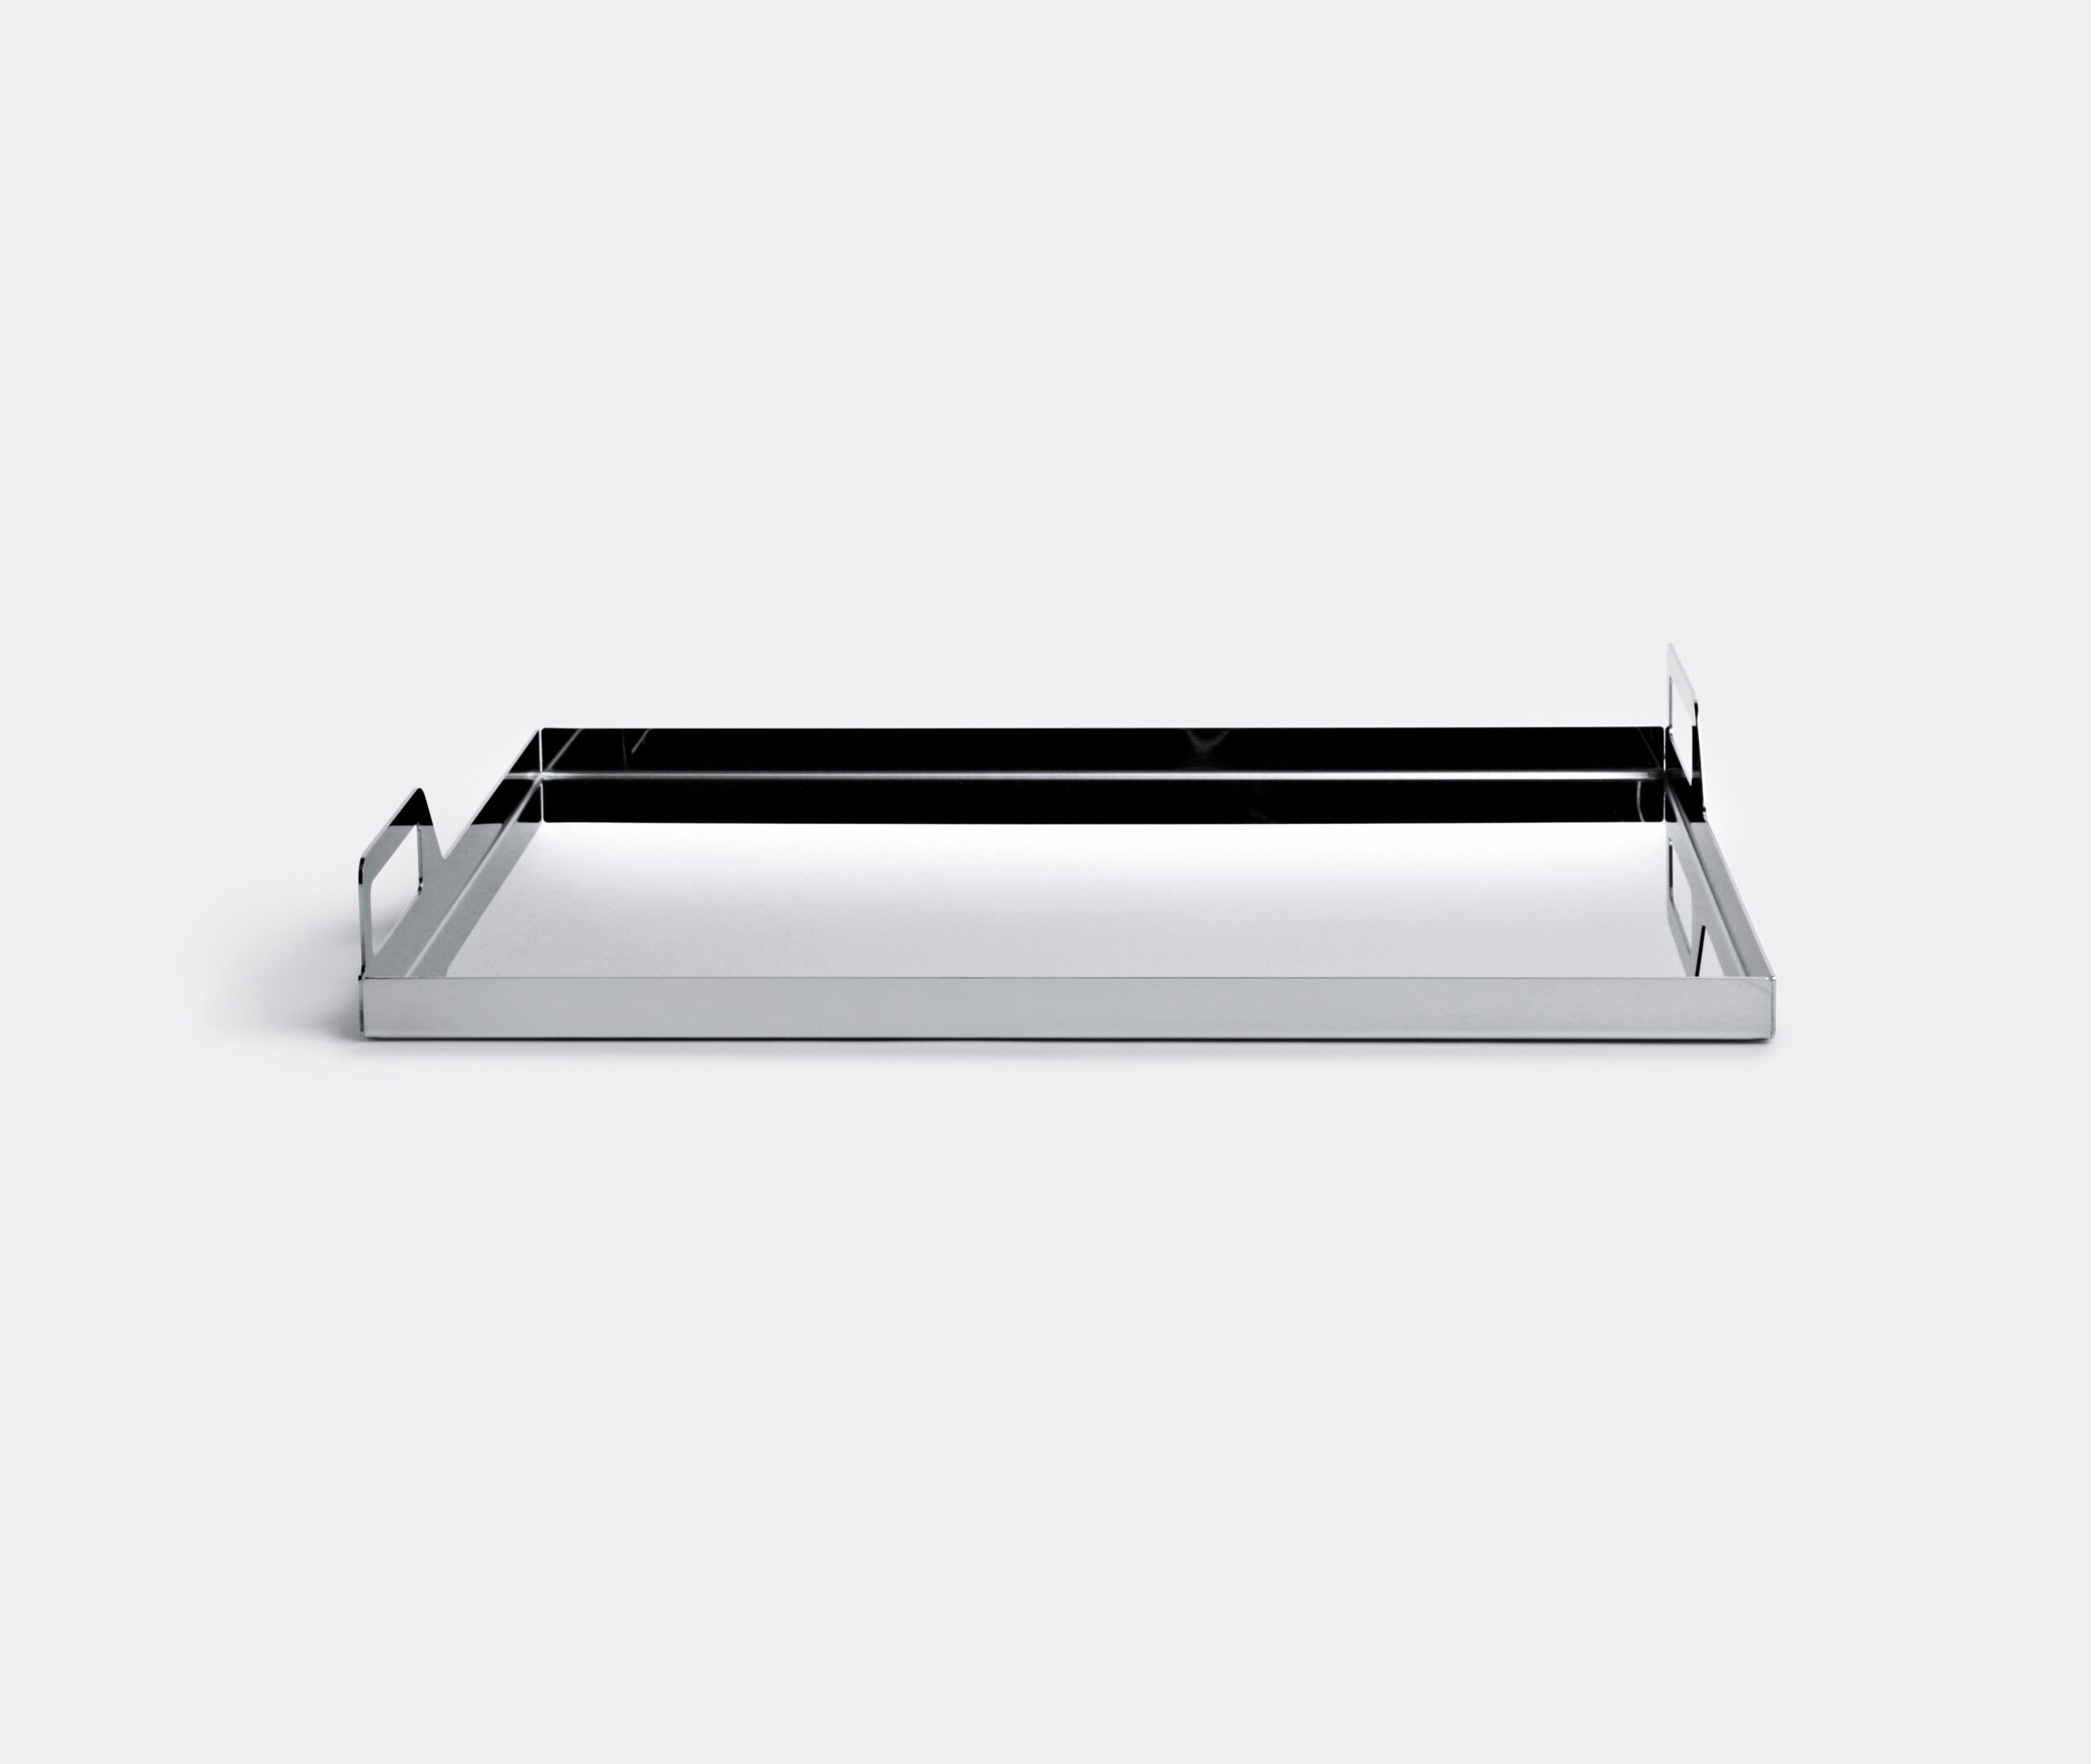 Rectangular Tray W/Handles Cm 45X35 Gio Ponti Luxury S/Steel